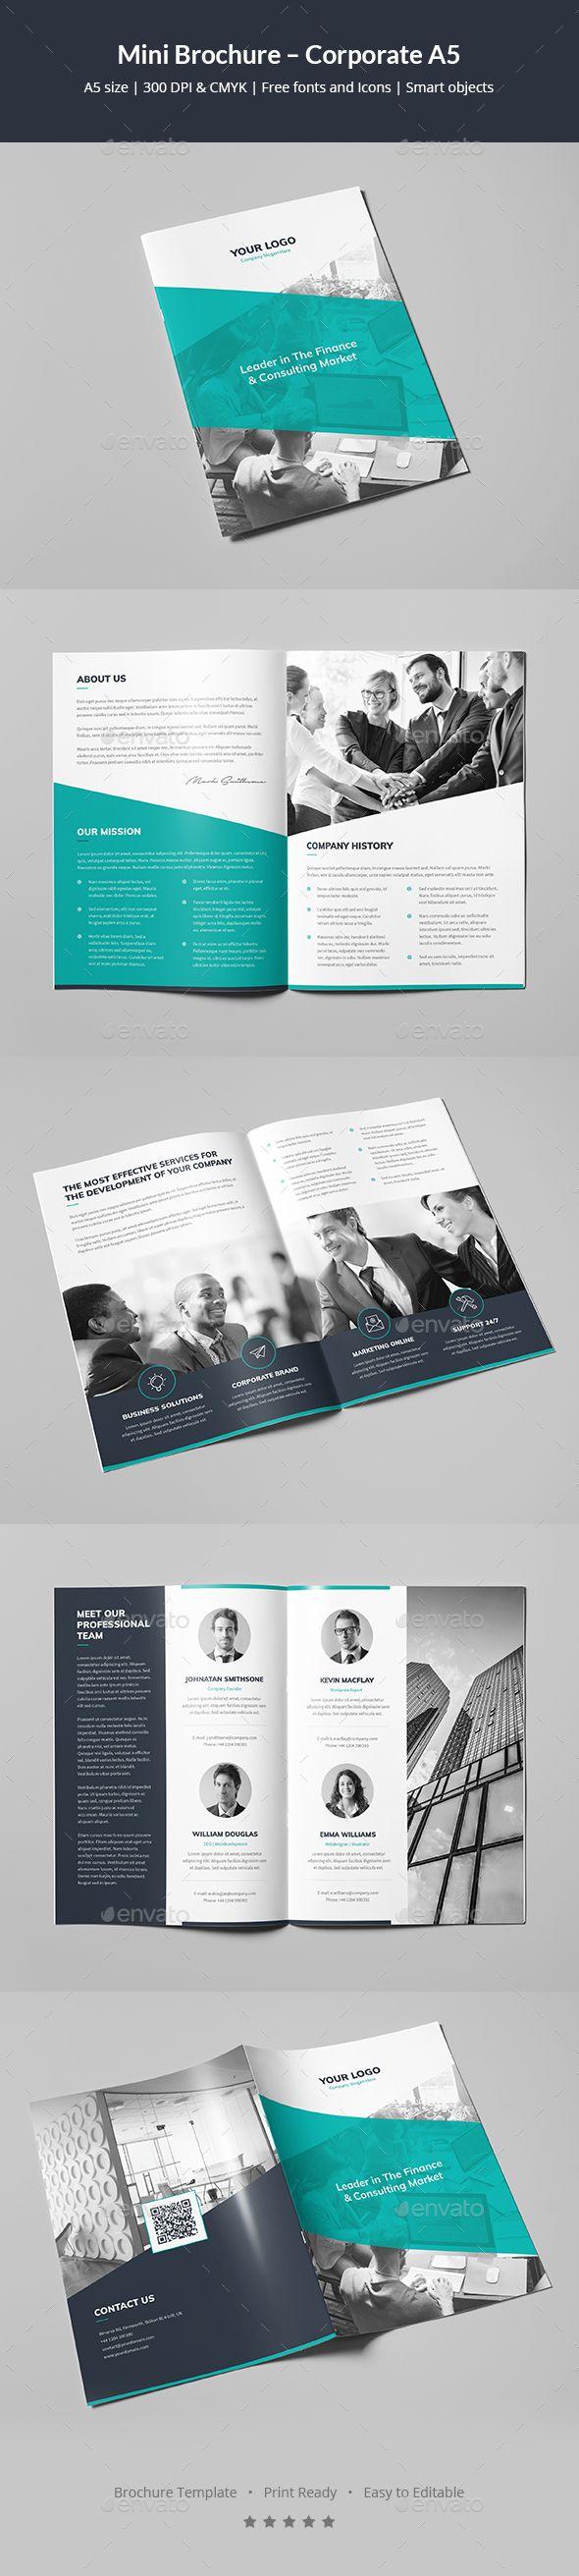 Mini Brochure Corporate A5 Brochures Corporate Brochure And